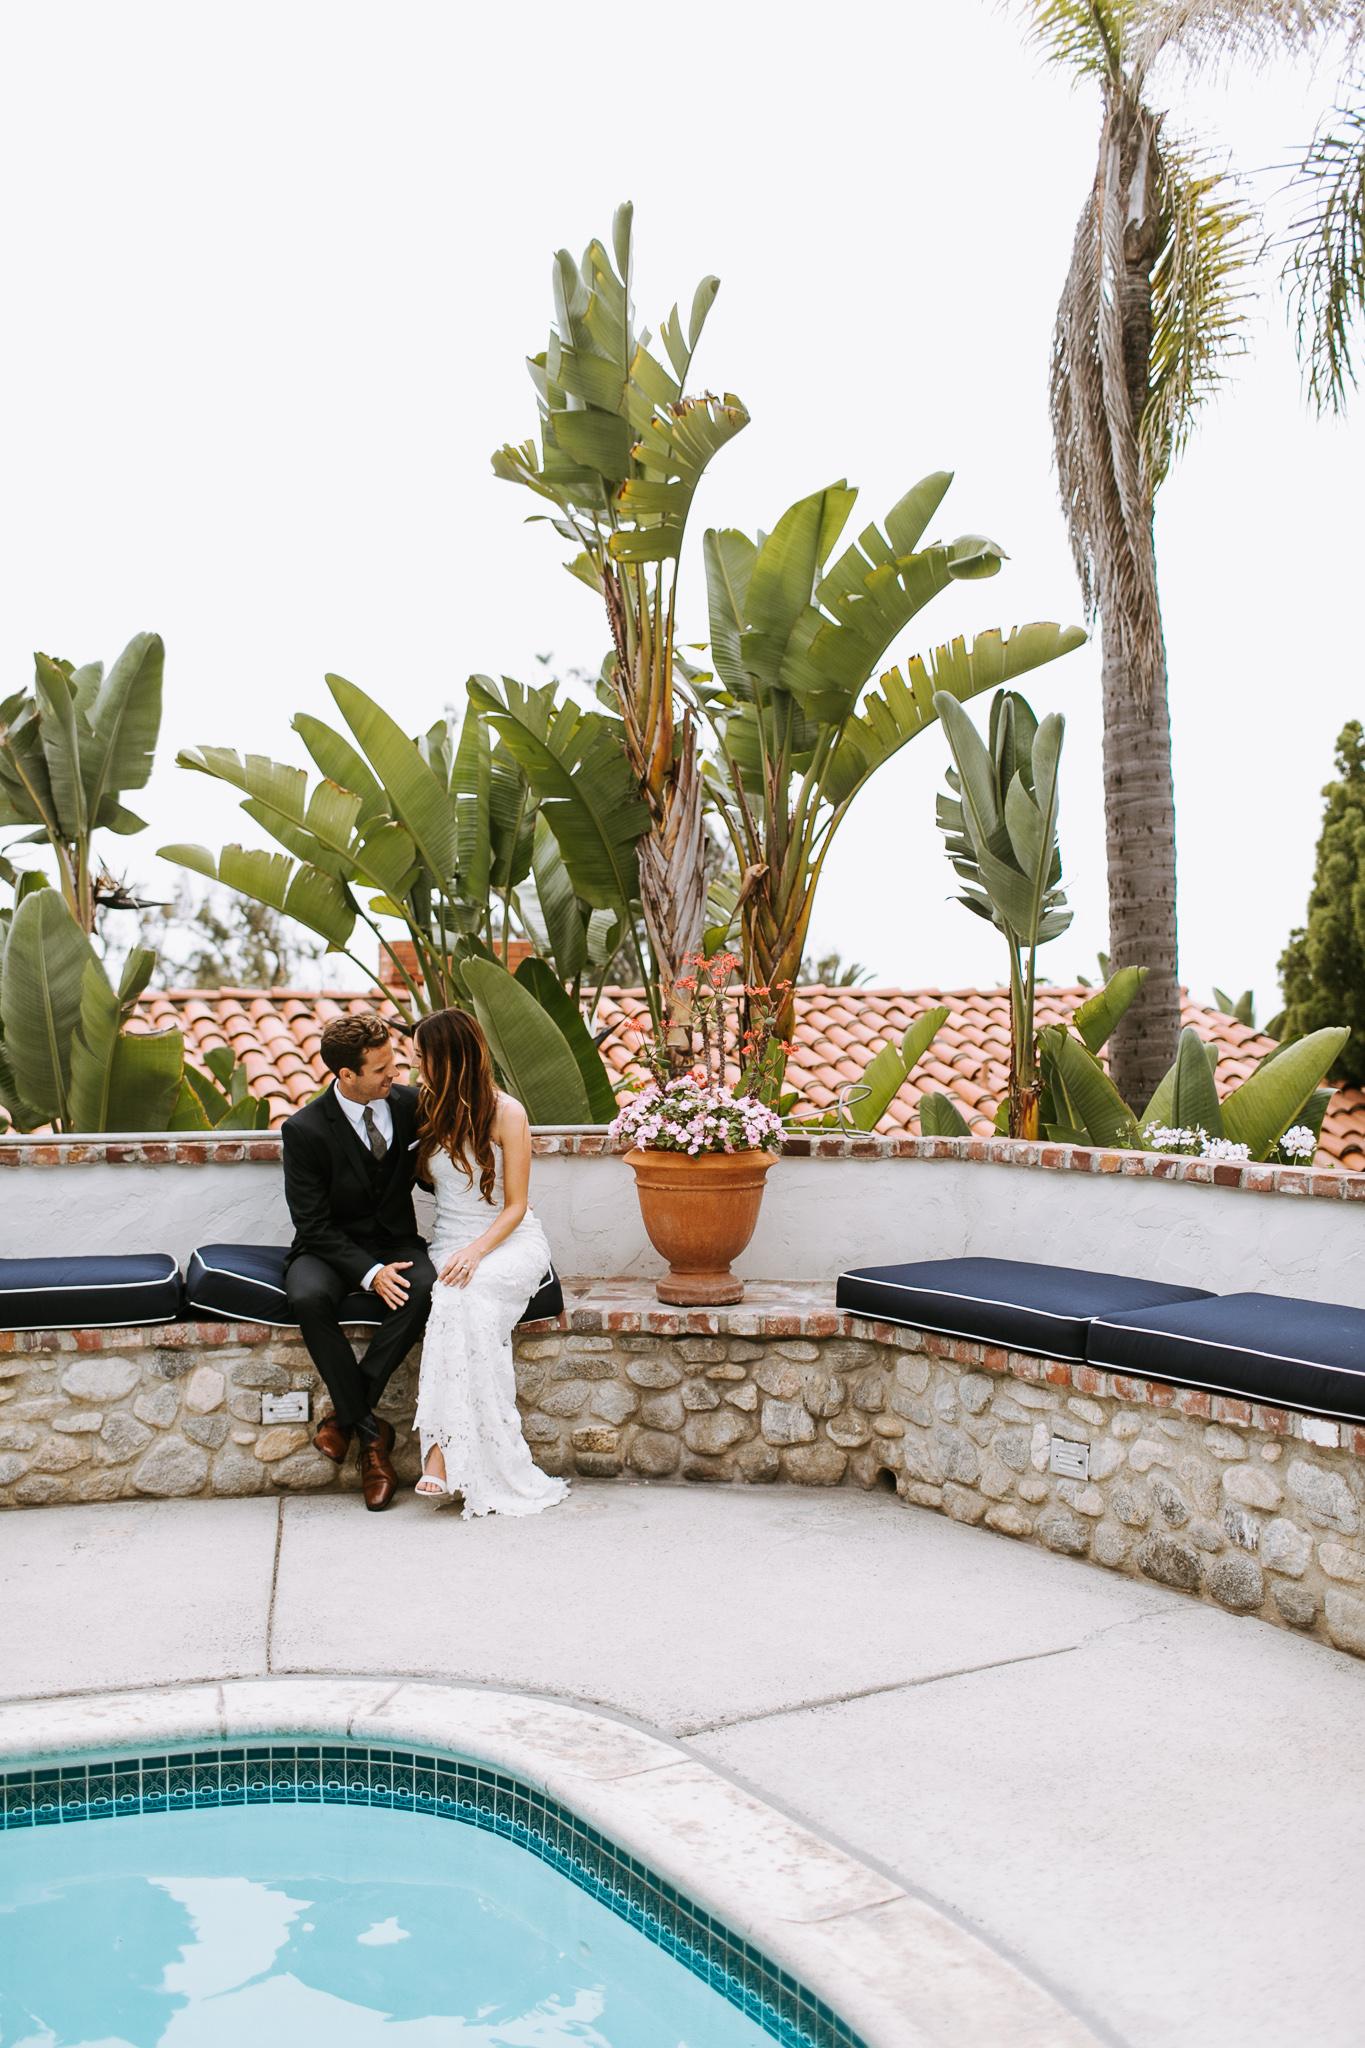 LagunaBeach-WeddingPhotographer-23.jpg